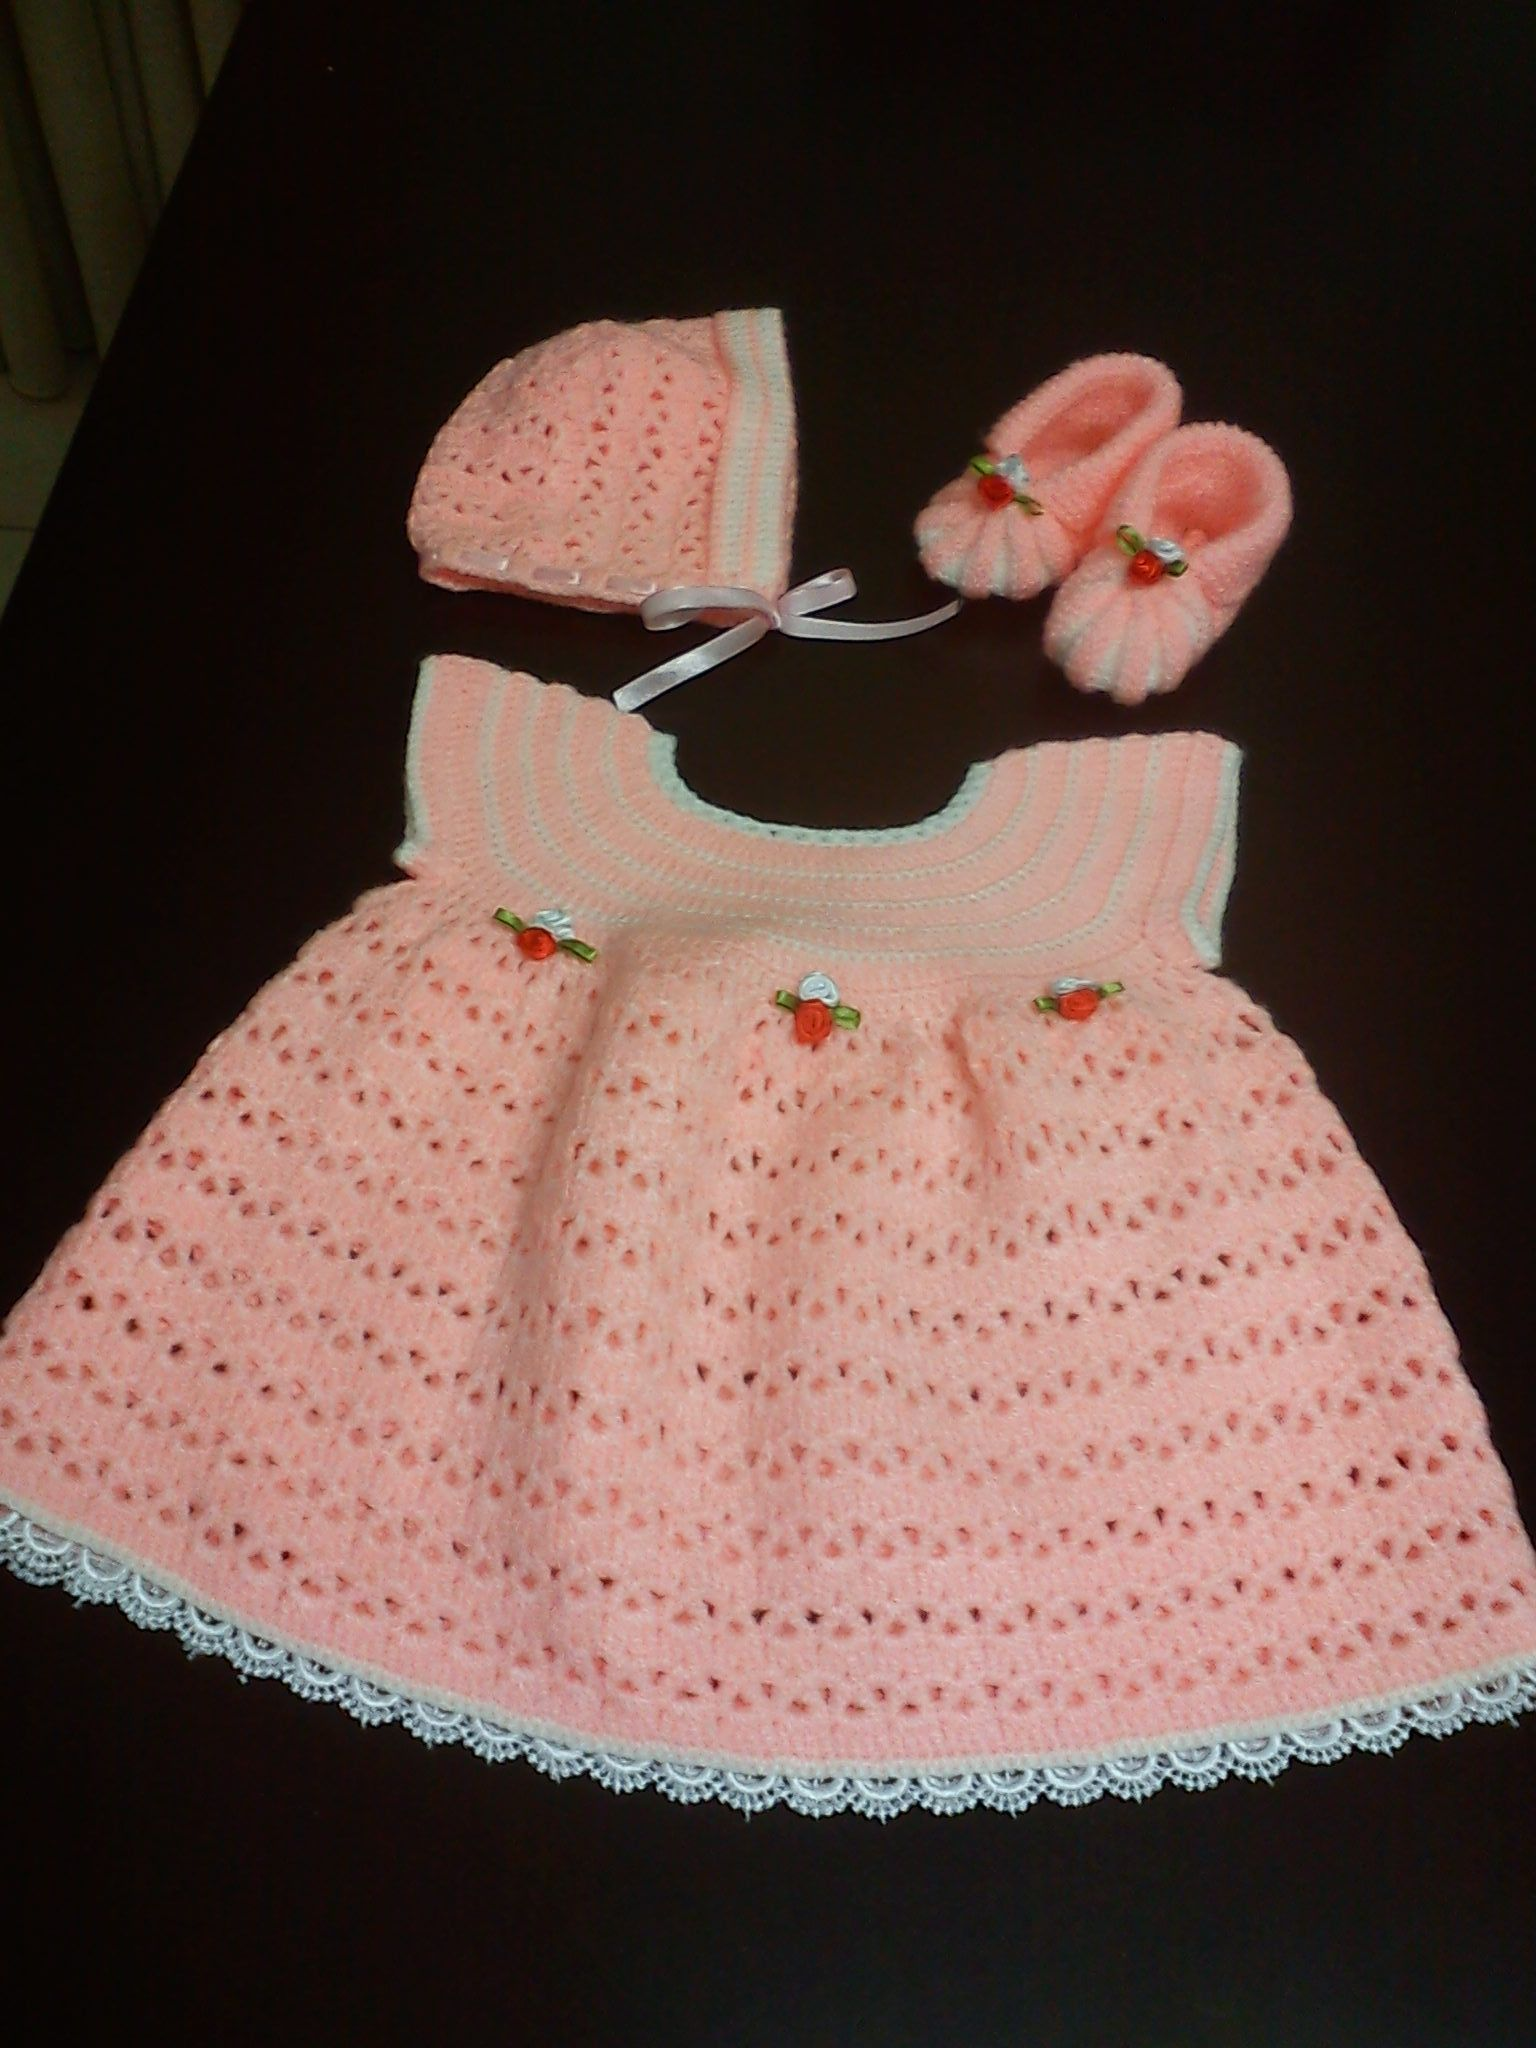 1792802b4f6 ΦΟΡΕΜΑΤΆΚΙ ΓΙΑ 1 ΕΤΩΝ | MALVINA | Pinterest | Summer dresses ...